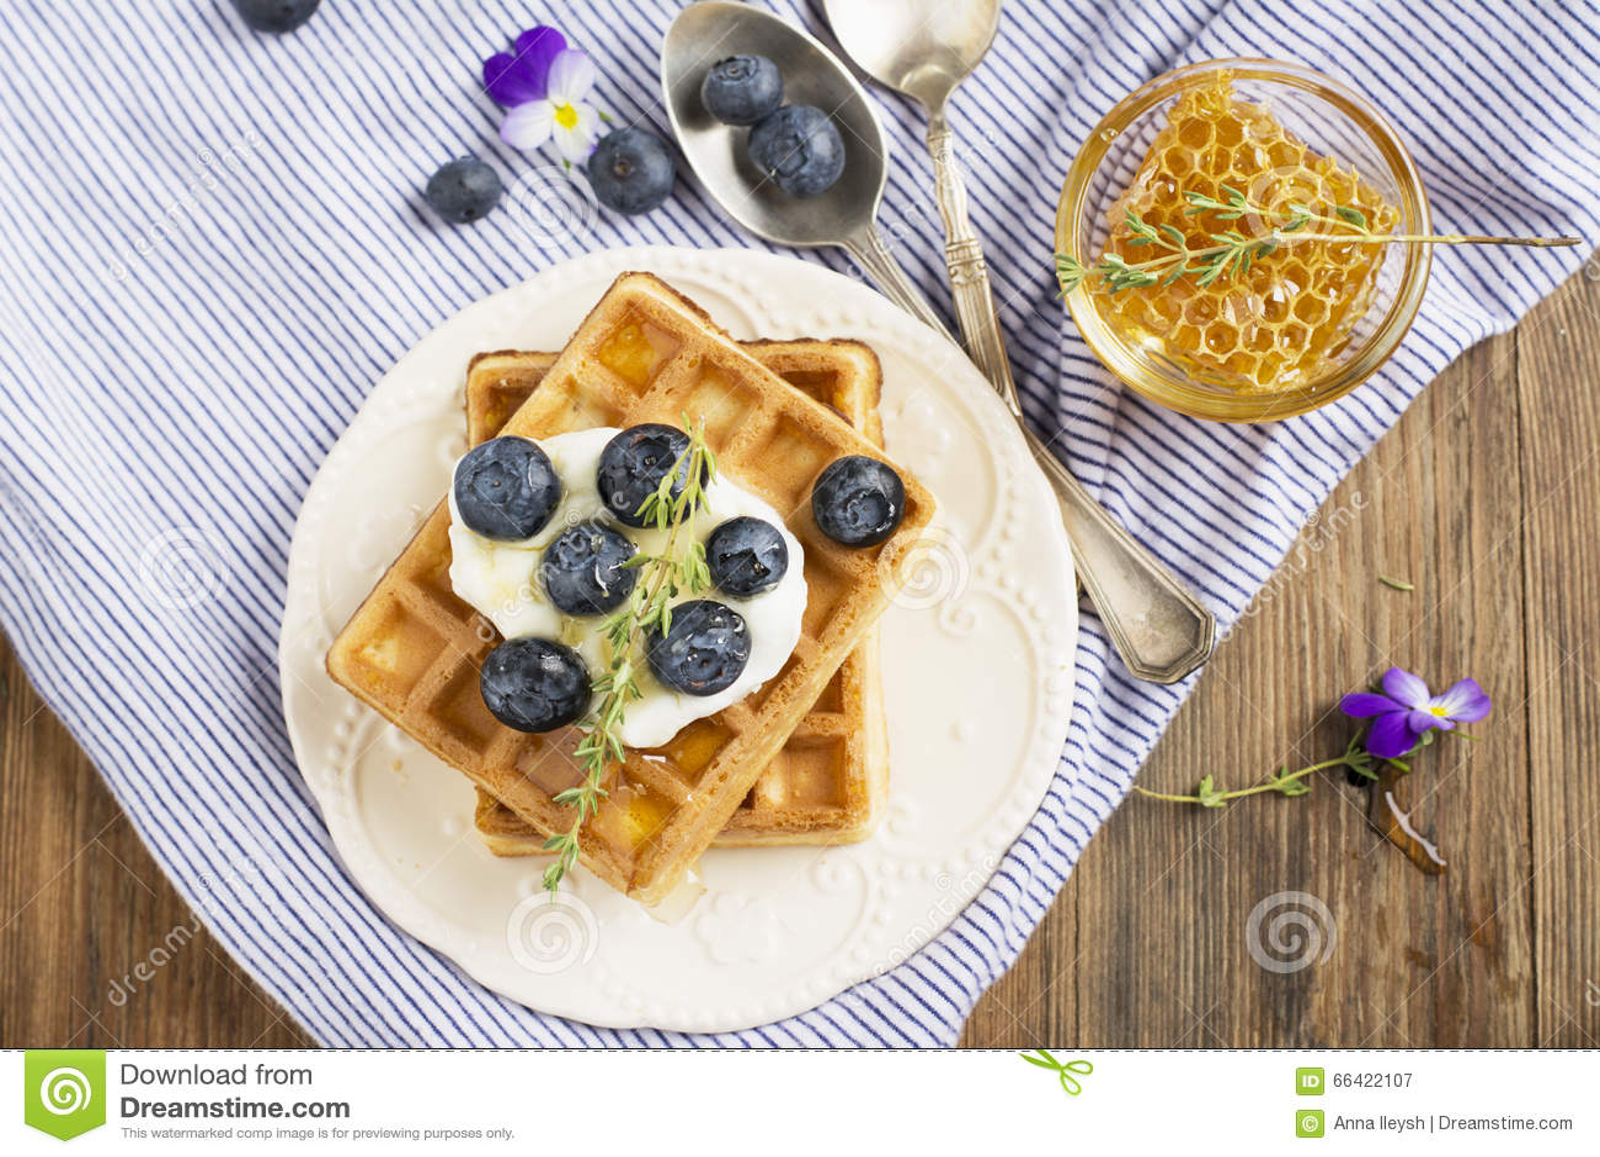 Homemade fresh crispy waffles for breakfast with blueberries